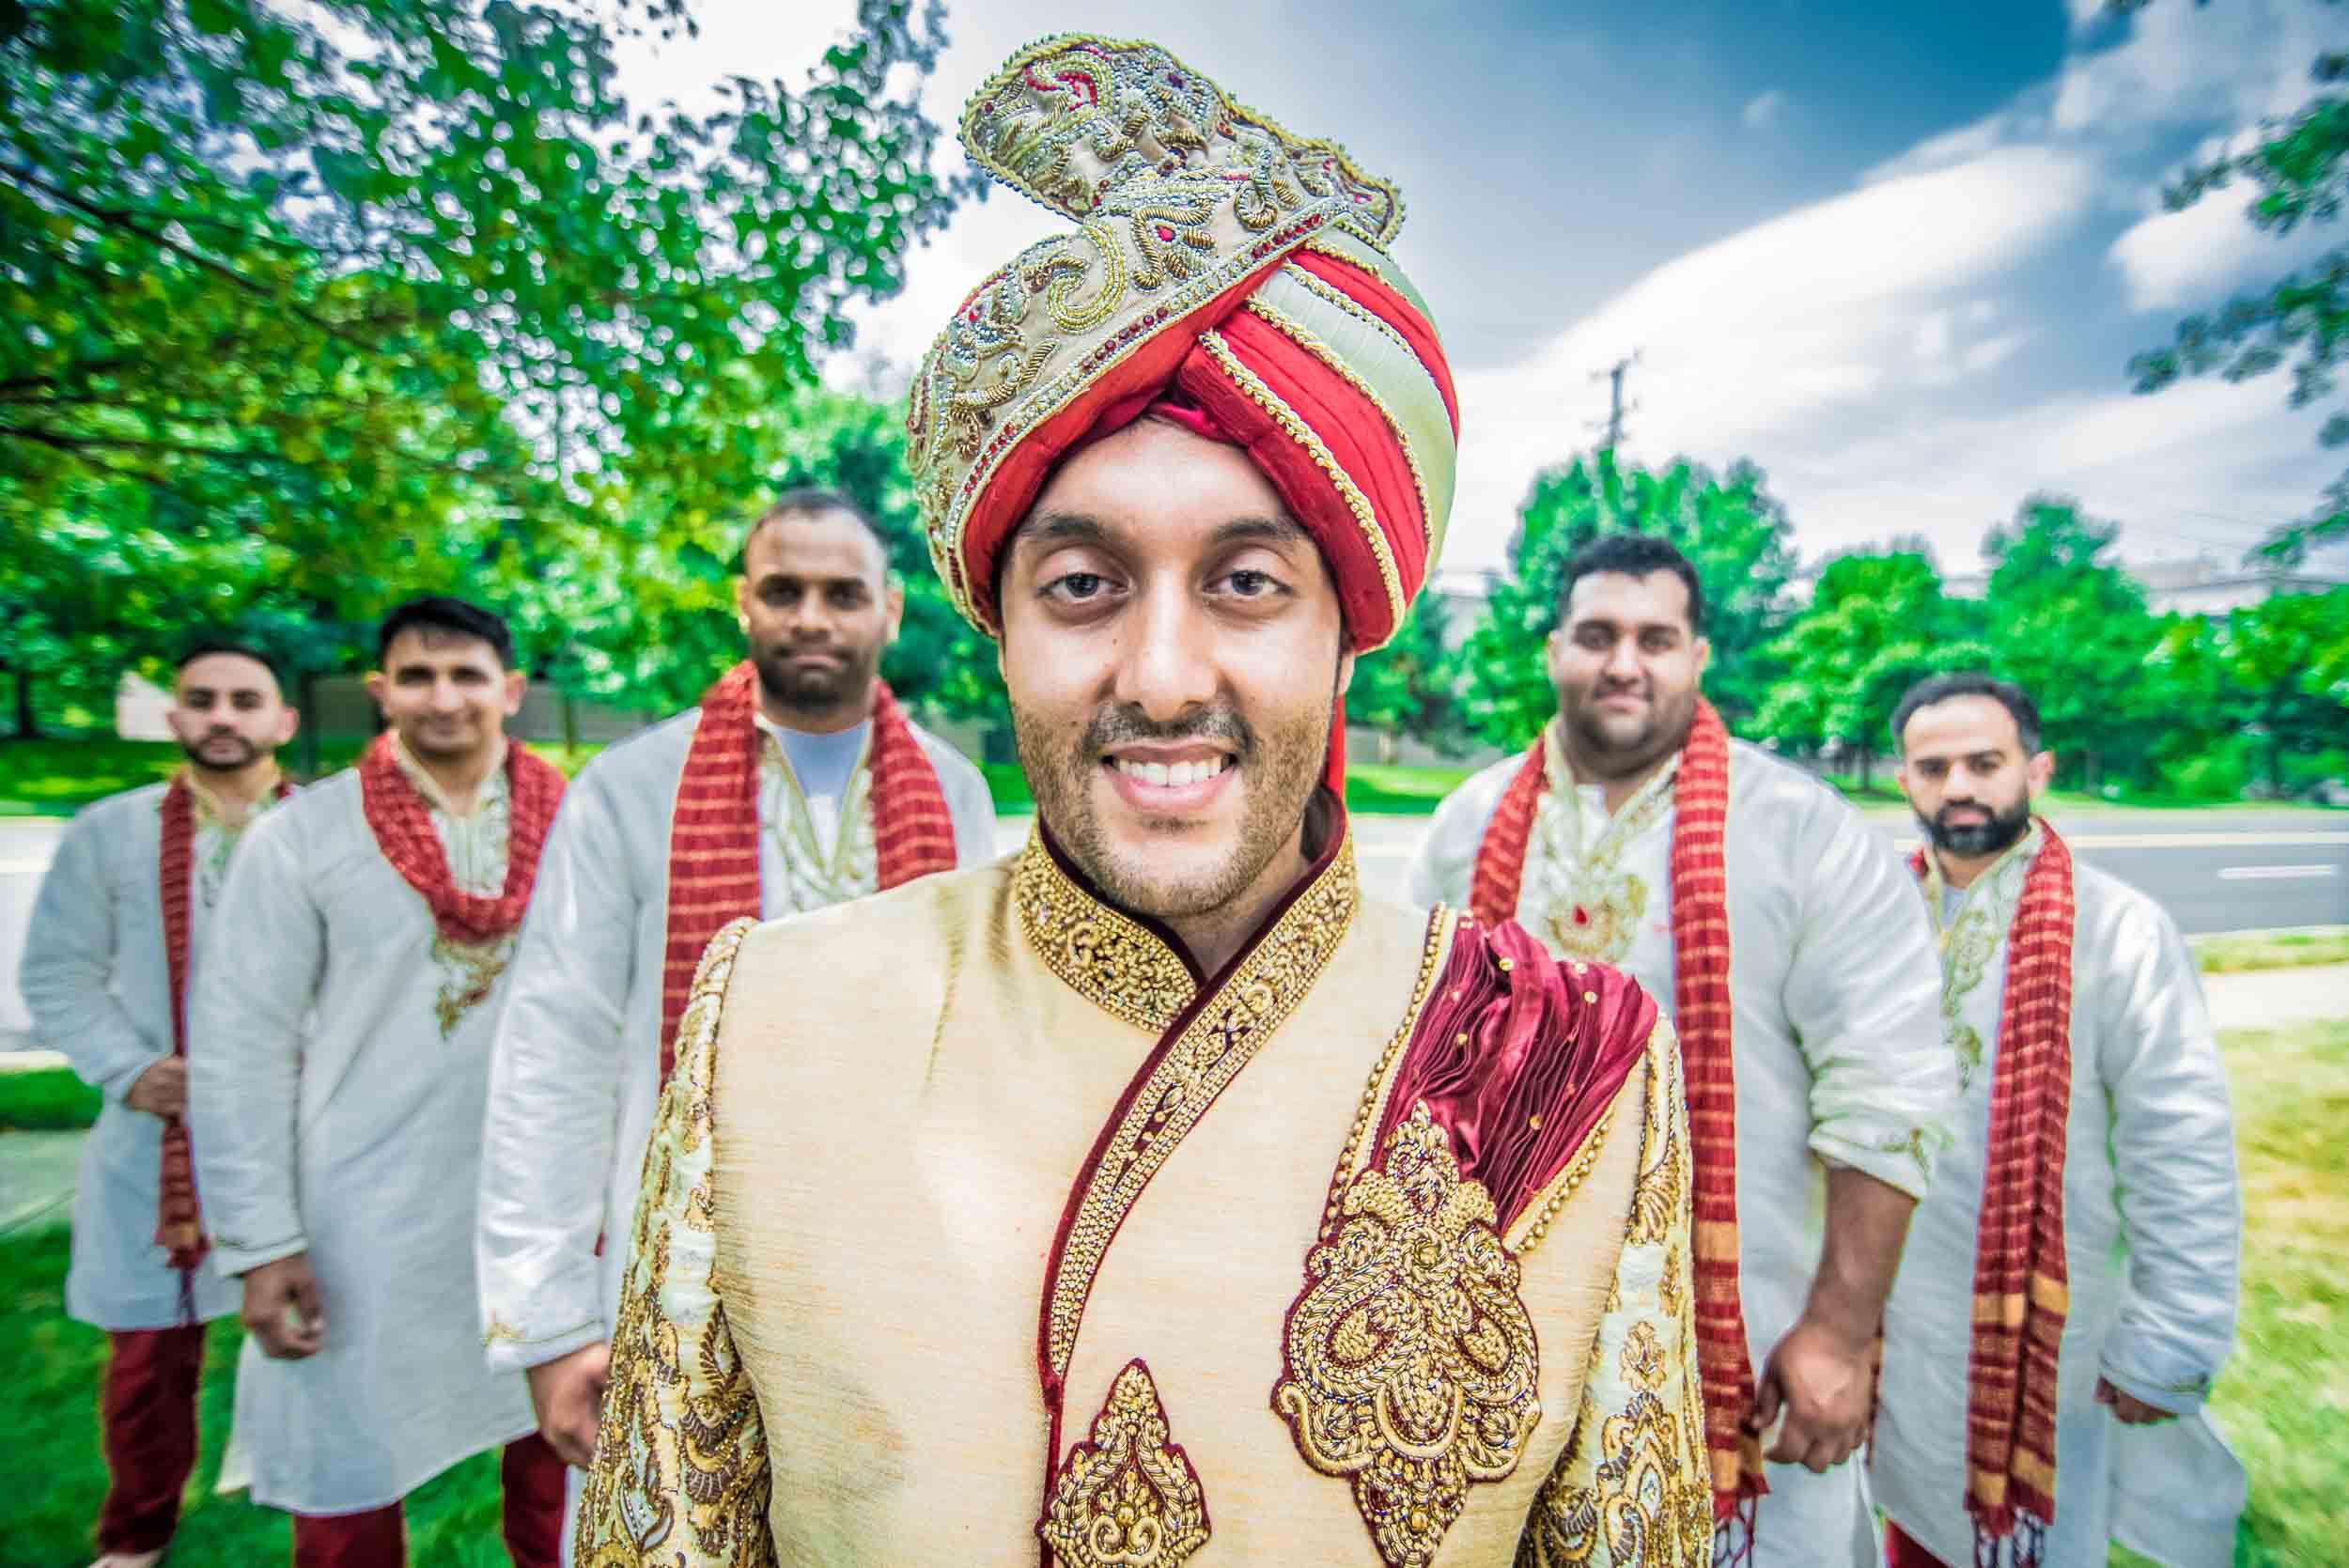 dc+metro+wedding+photographer+vadym+guliuk+photography+weddings+groomsmen-2024.jpg